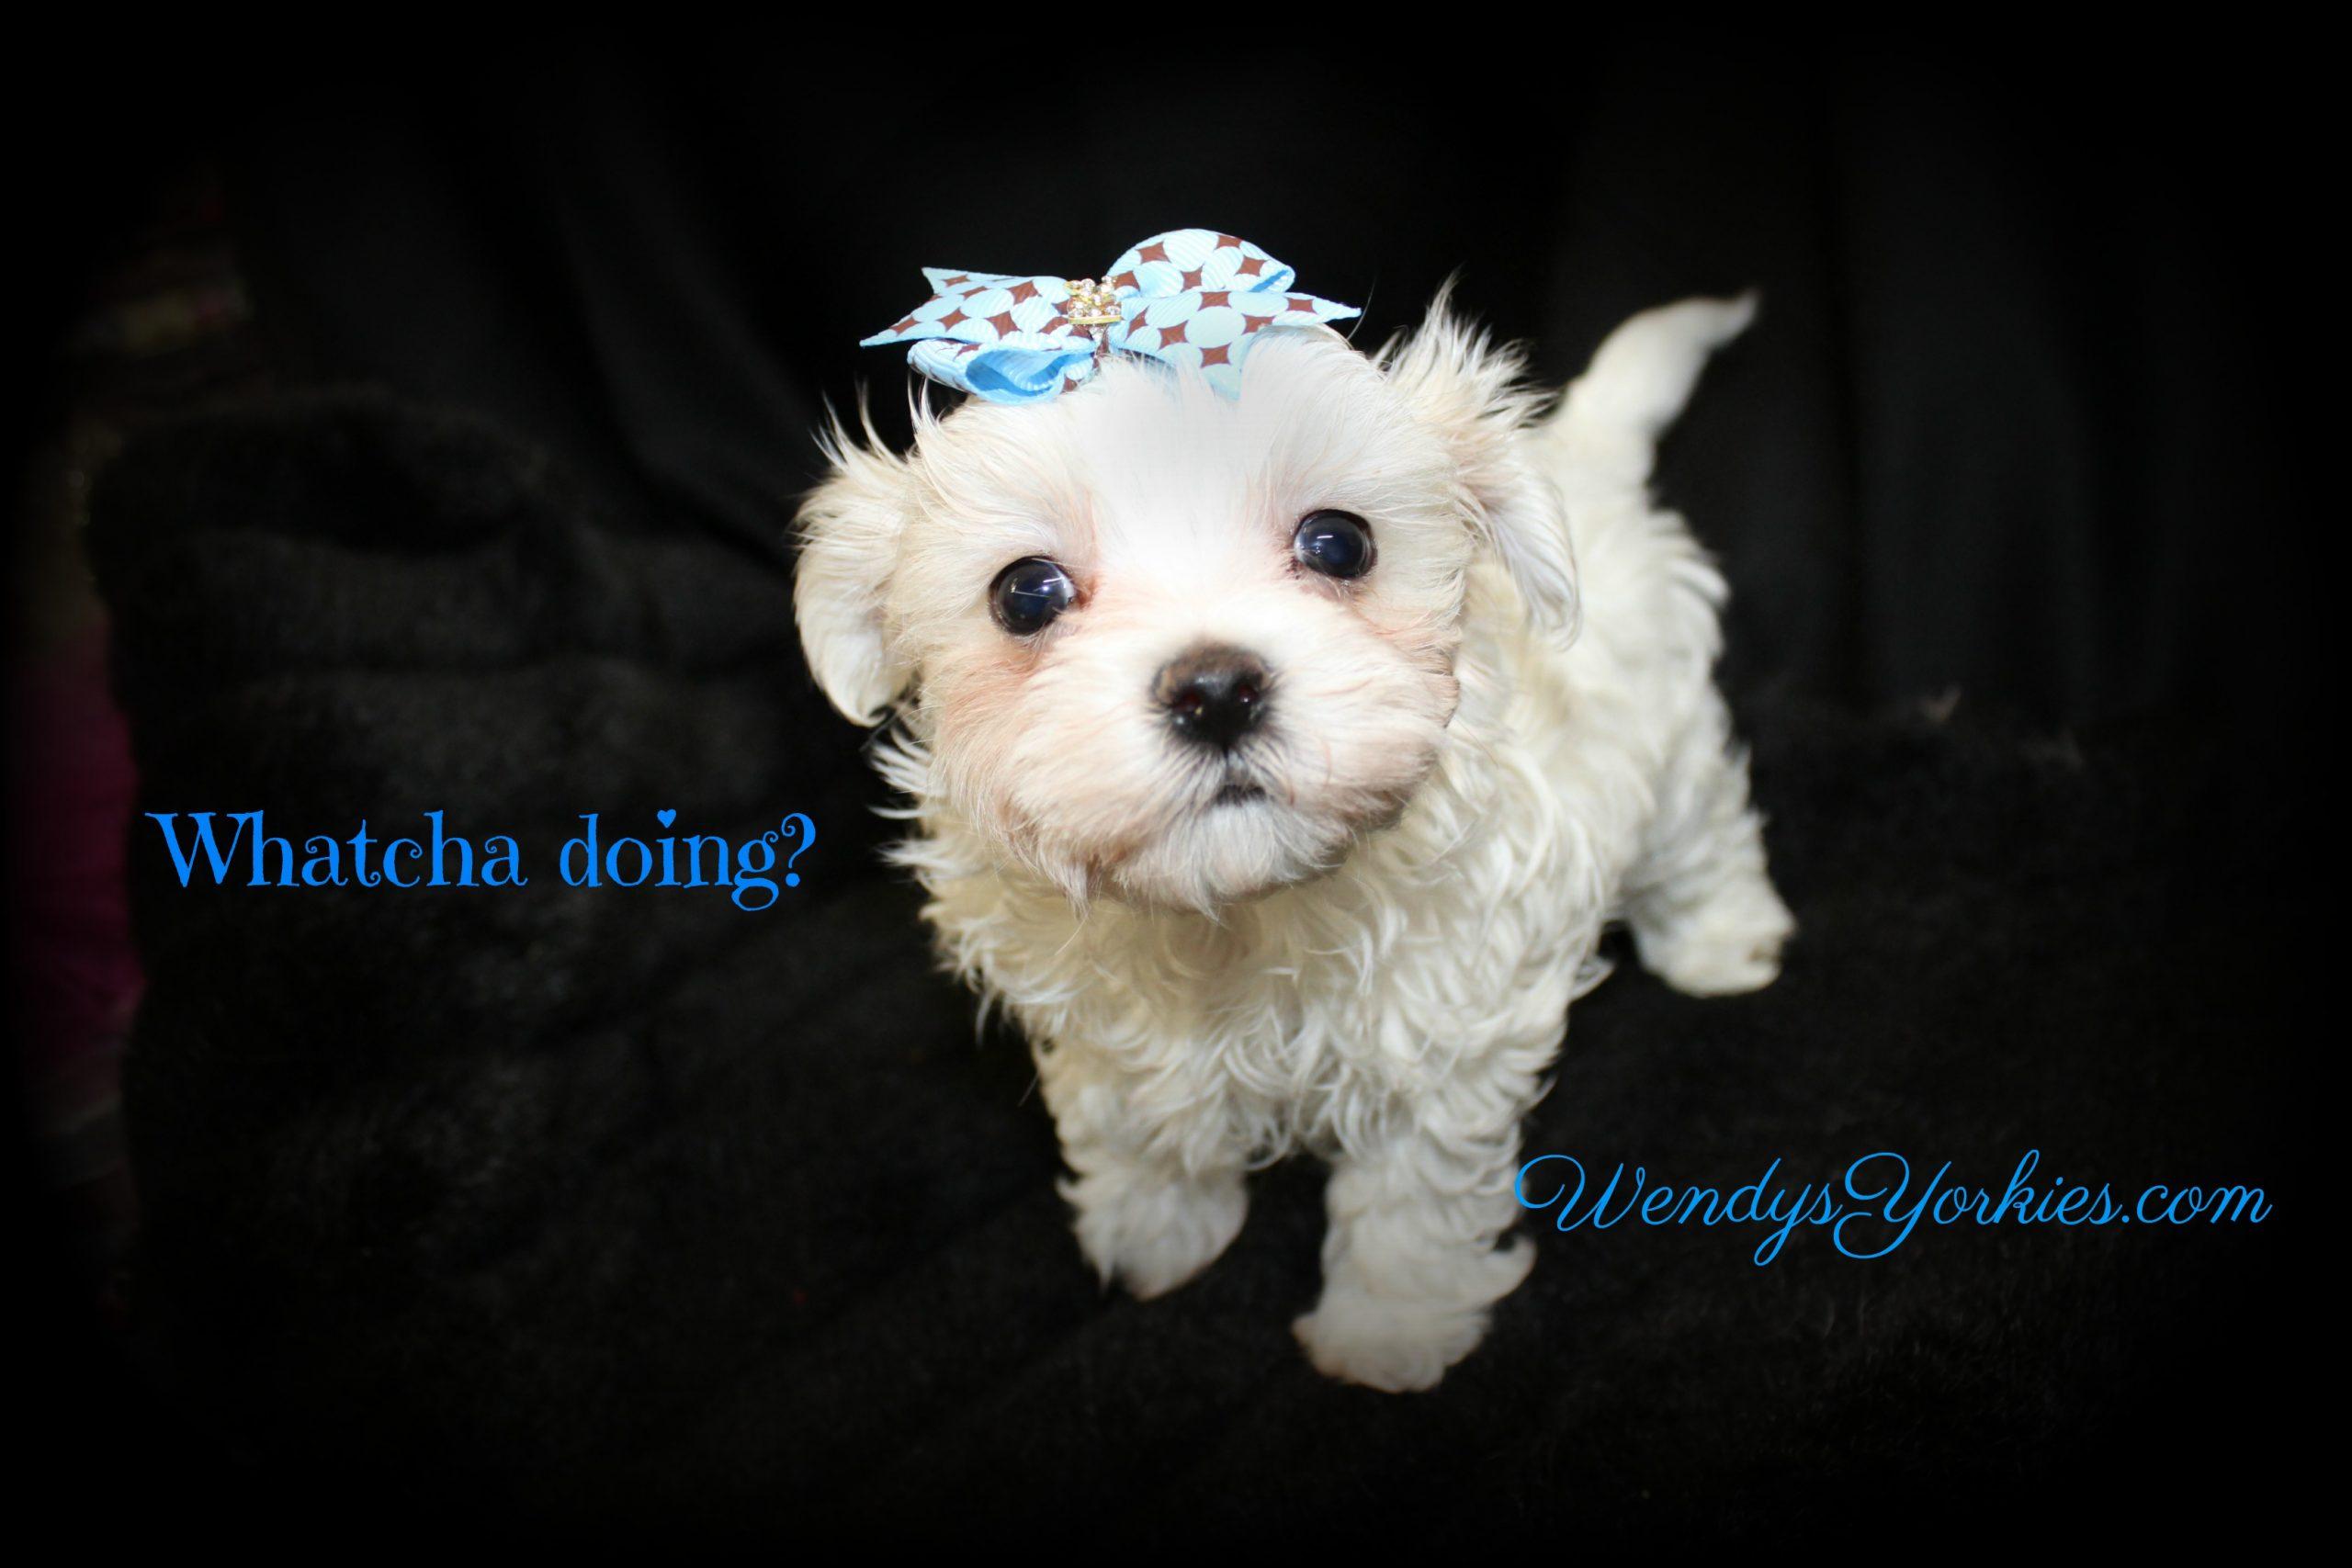 Cute Maltese puppy for sale in Texas, Zeus, WendysYorkies.com